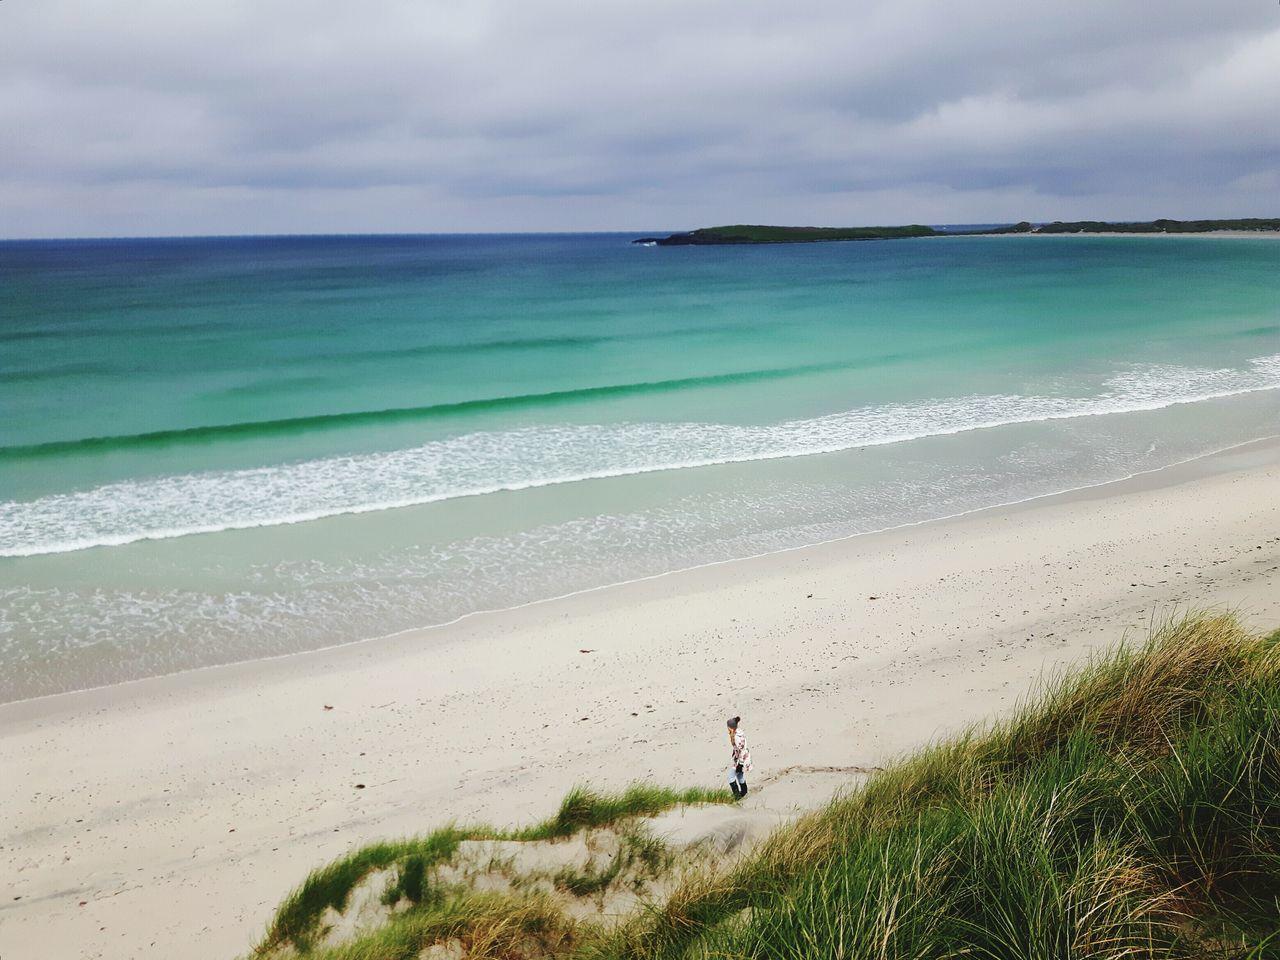 Coastline Horizon Over Water Water's Edge Sand Dune Scottish Beaches Scotland Scottish Beach Nortuist The Great Outdoors - 2017 EyeEm Awards Hebrides Outerhebrides Isleofbarra Barra Live For The Story EyeEmNewHere Beauty In Nature Uist